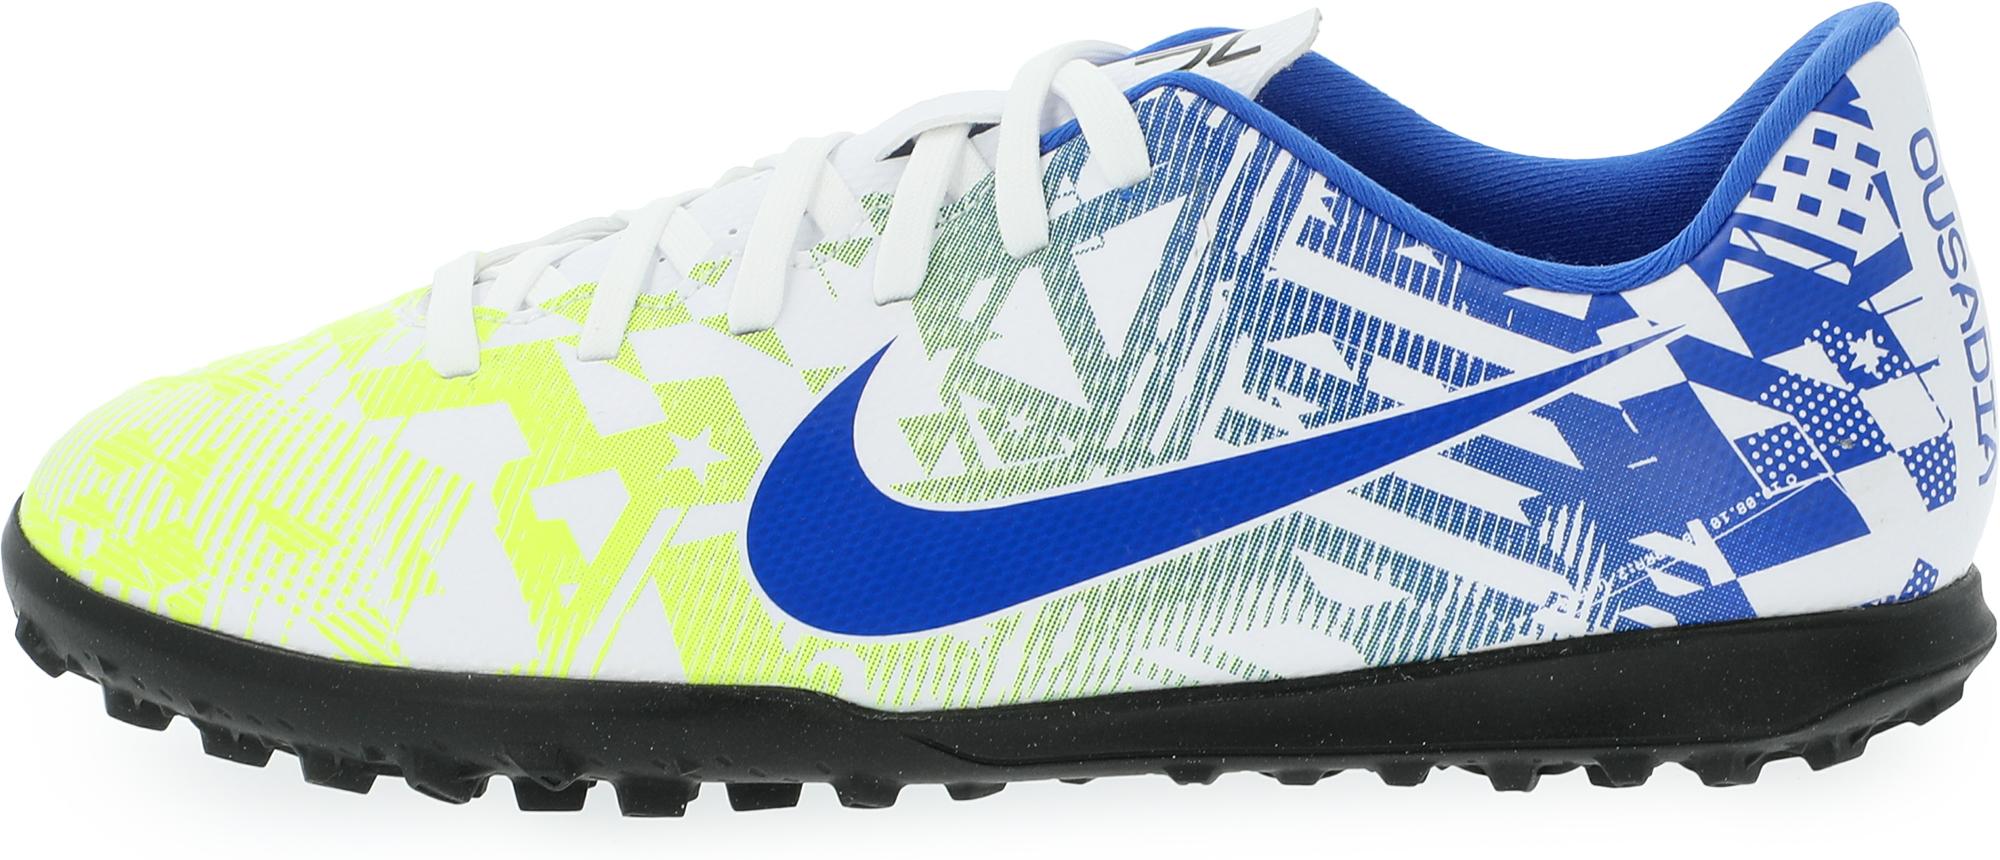 цена Nike Бутсы для мальчиков Nike Jr Vapor 13 Club Njr Tf, размер 35.5 онлайн в 2017 году